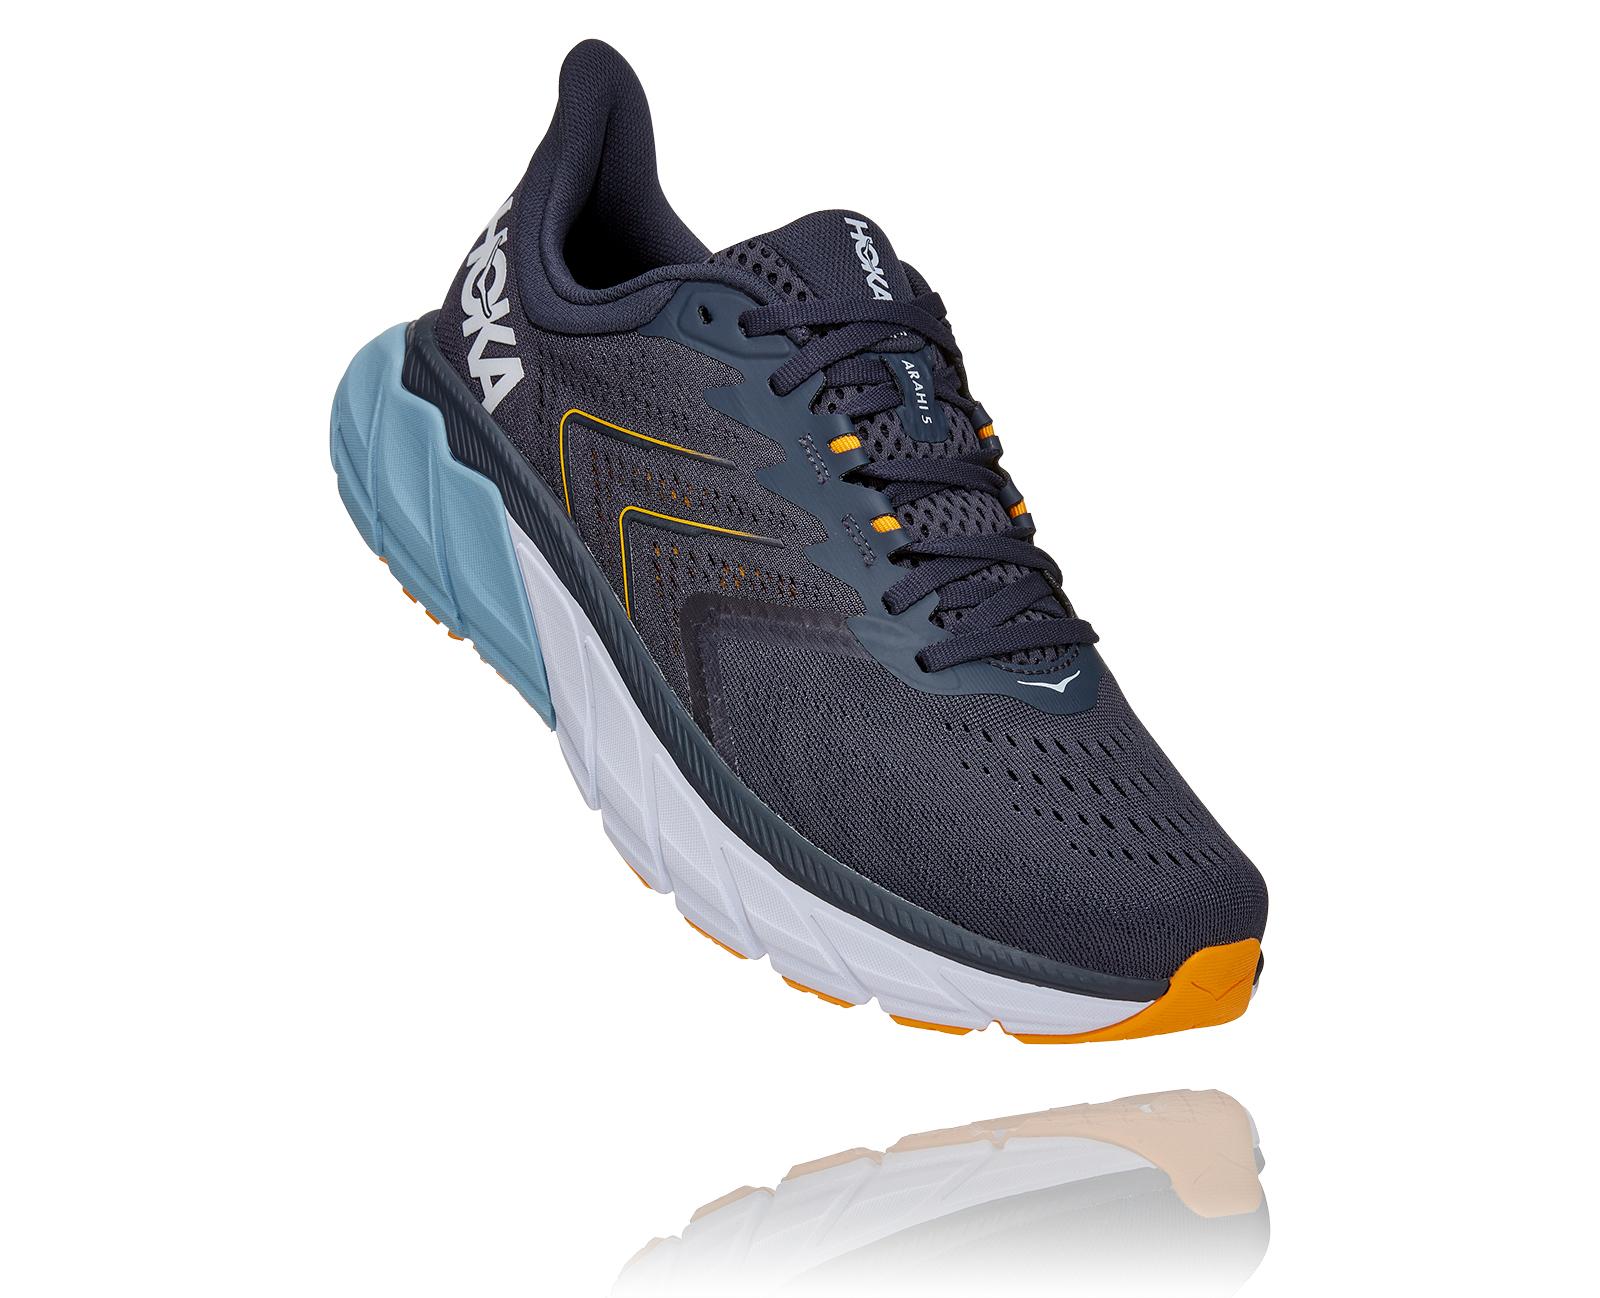 Men's Arahi 5 - Hoka One One Athletic Shoes-Hoka One One